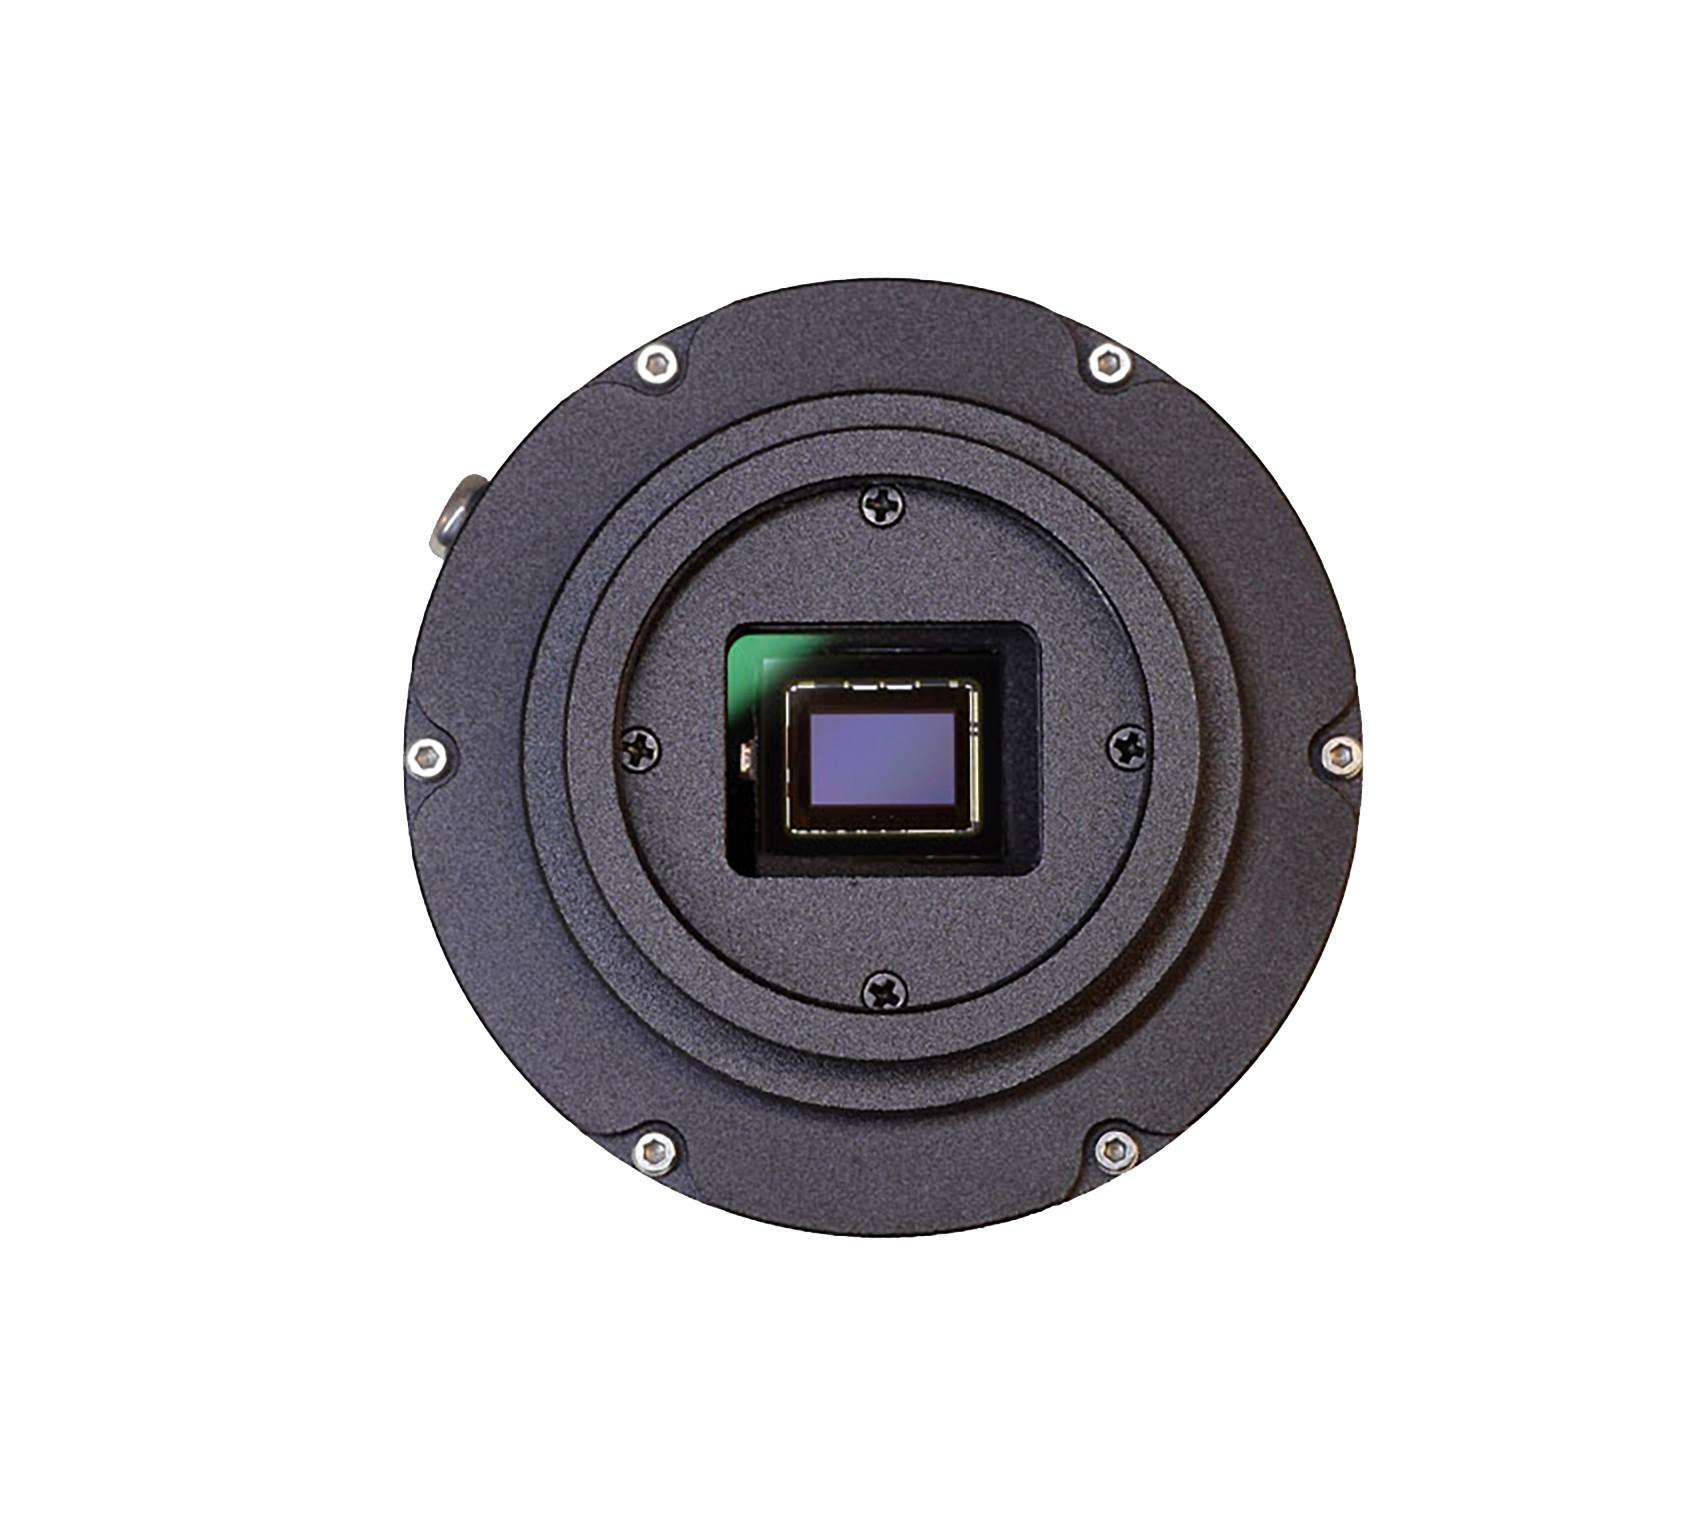 QHY550 P/M CMOS Kamera mit integriertem Polarisationsfilter